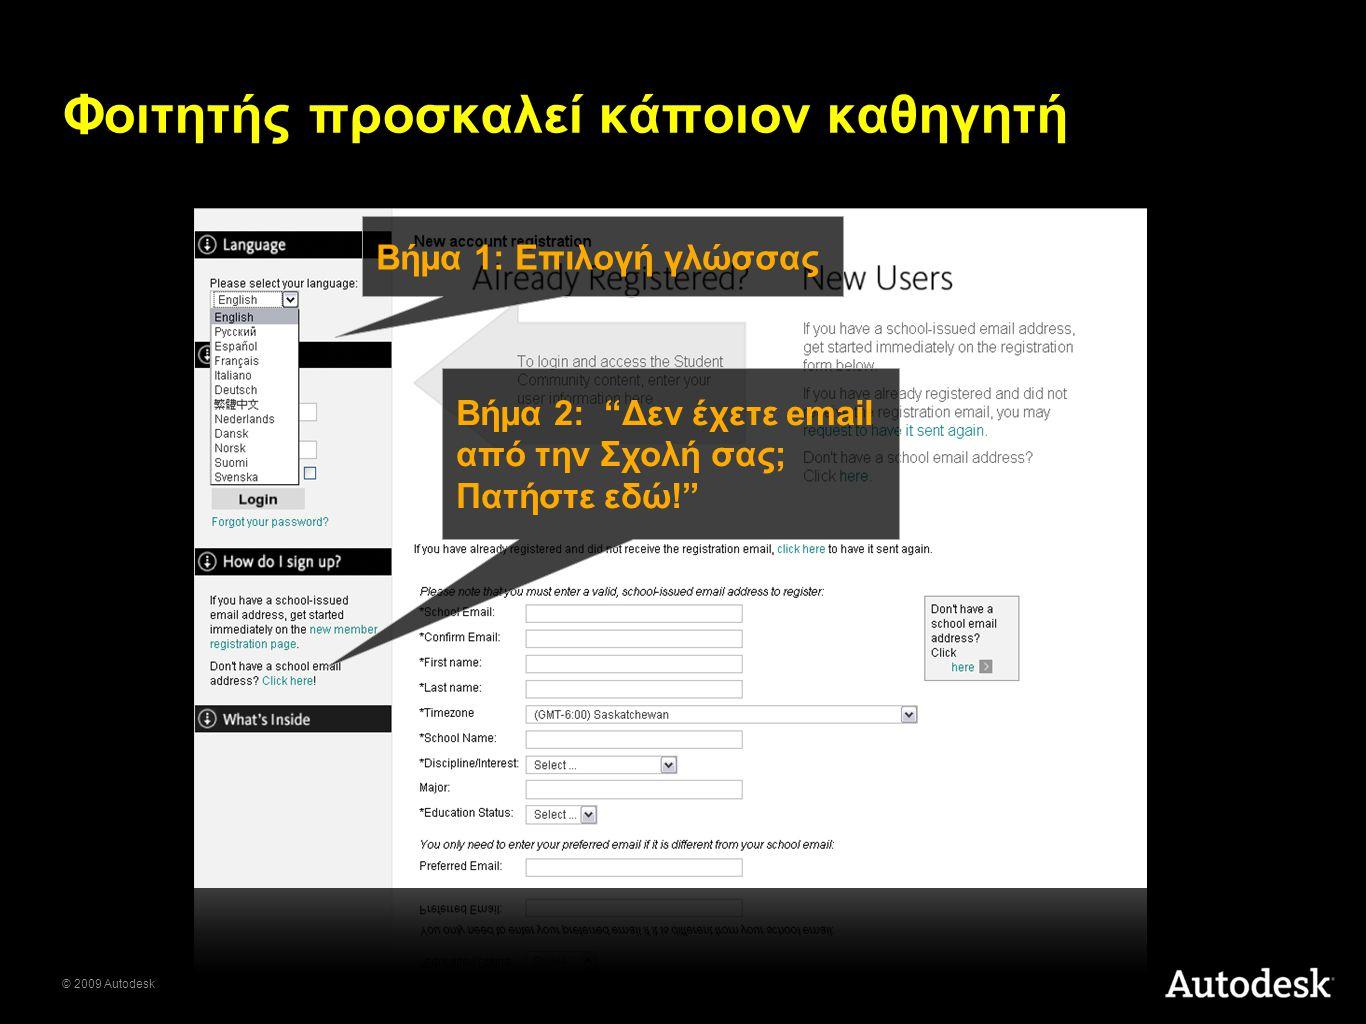 "© 2009 Autodesk Βήμα 1: Επιλογή γλώσσας Βήμα 2: ""Δεν έχετε email από την Σχολή σας; Πατήστε εδώ!"" Φοιτητής προσκαλεί κάποιον καθηγητή"